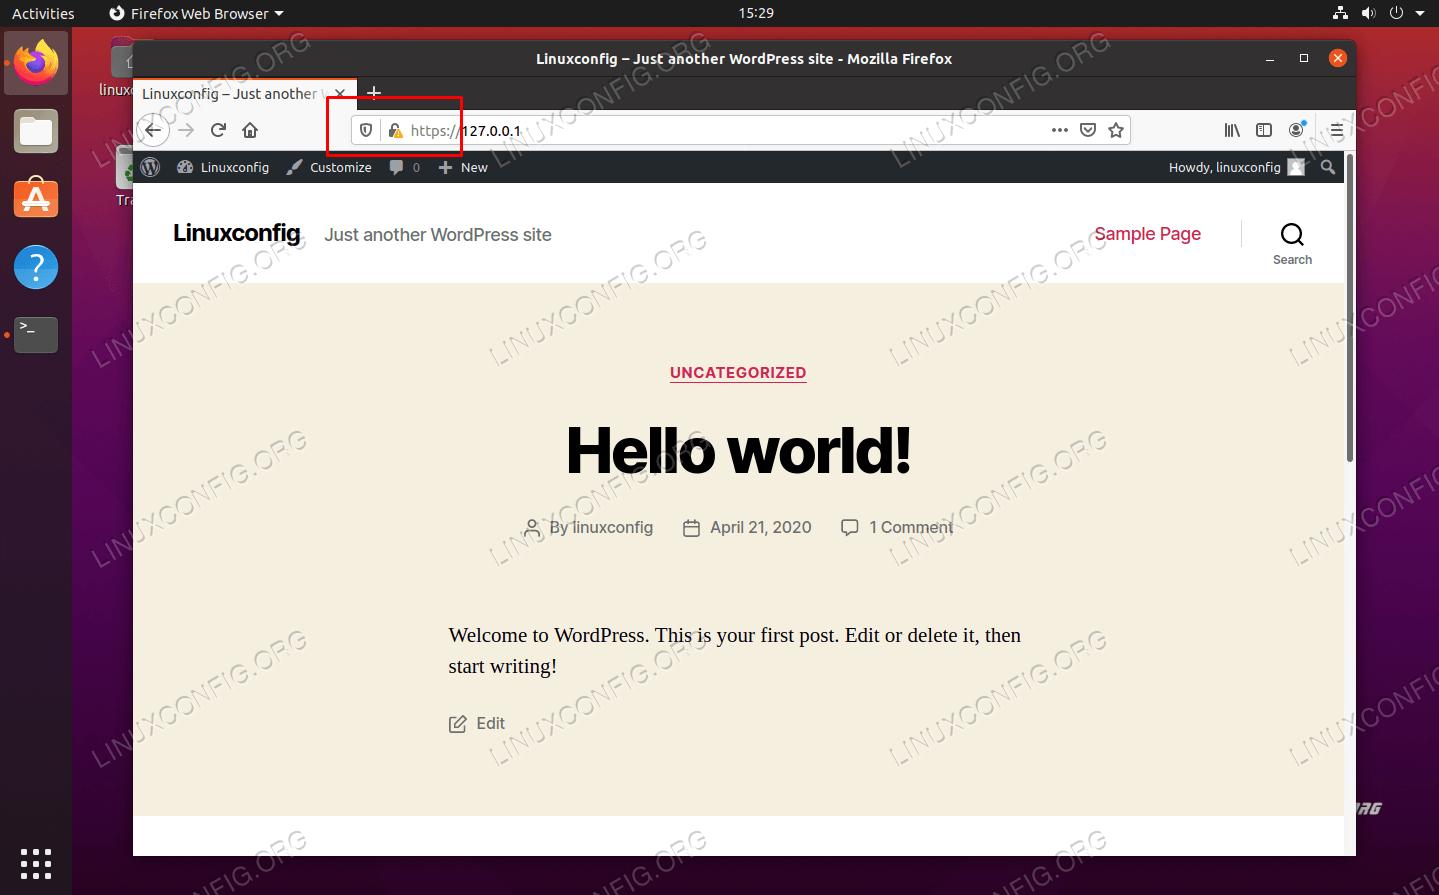 The WordPress website is now using SSL (HTTPS) encryption